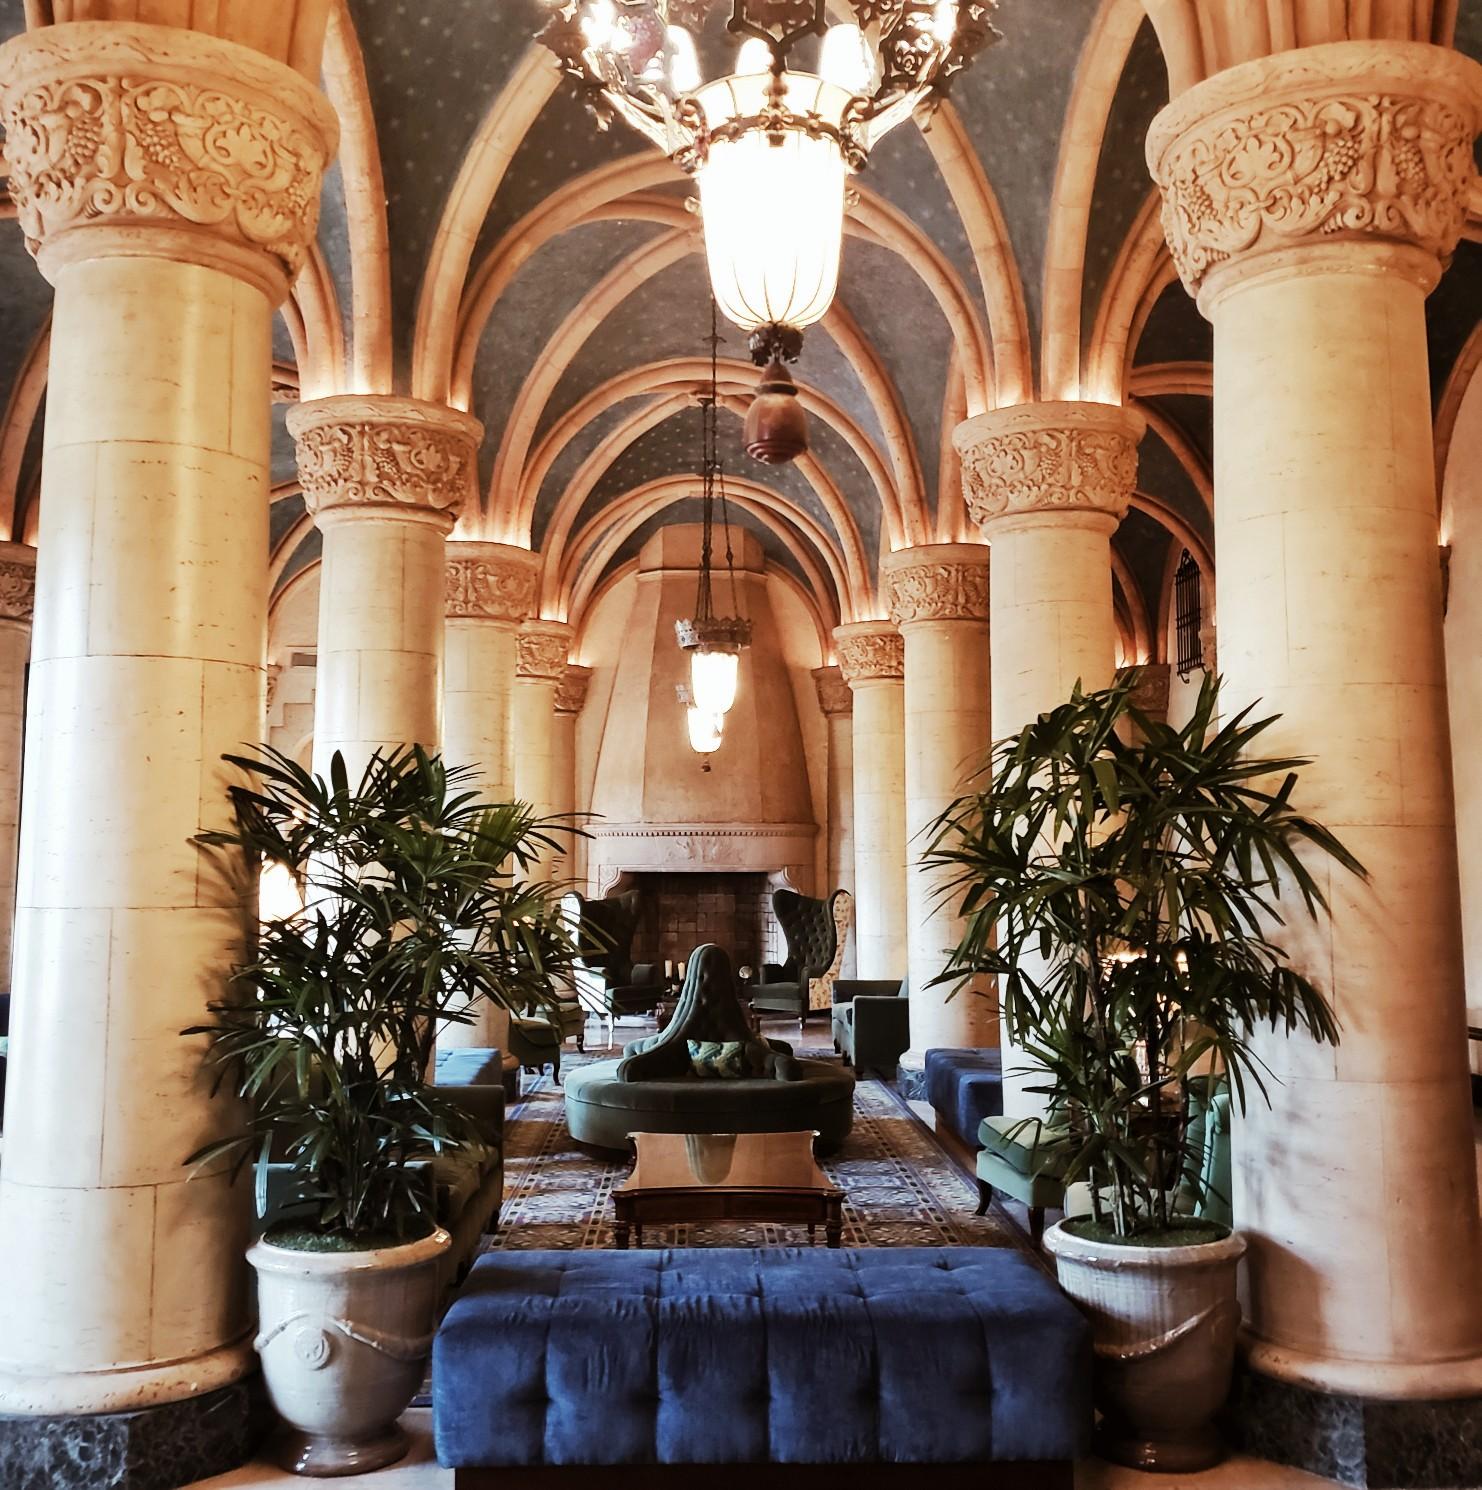 Biltmore Hotel Miami Coral Gables Exquisite Lobby Design